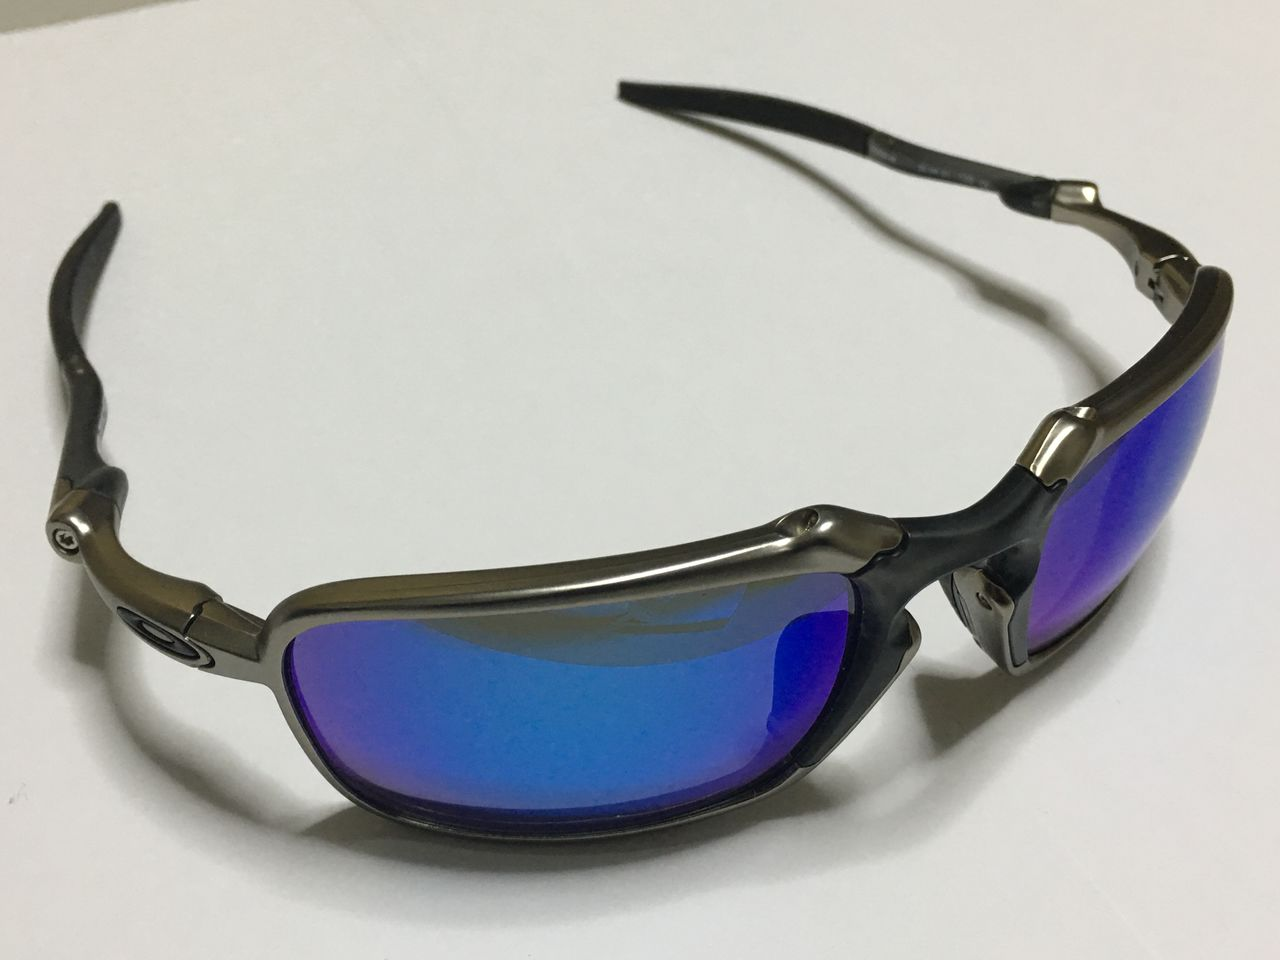 FS: Xsquared, Carbon frame OOBIP sku oo6011-08, Badman Plasma frame with Sapphire lenses - IMG_1385.jpg